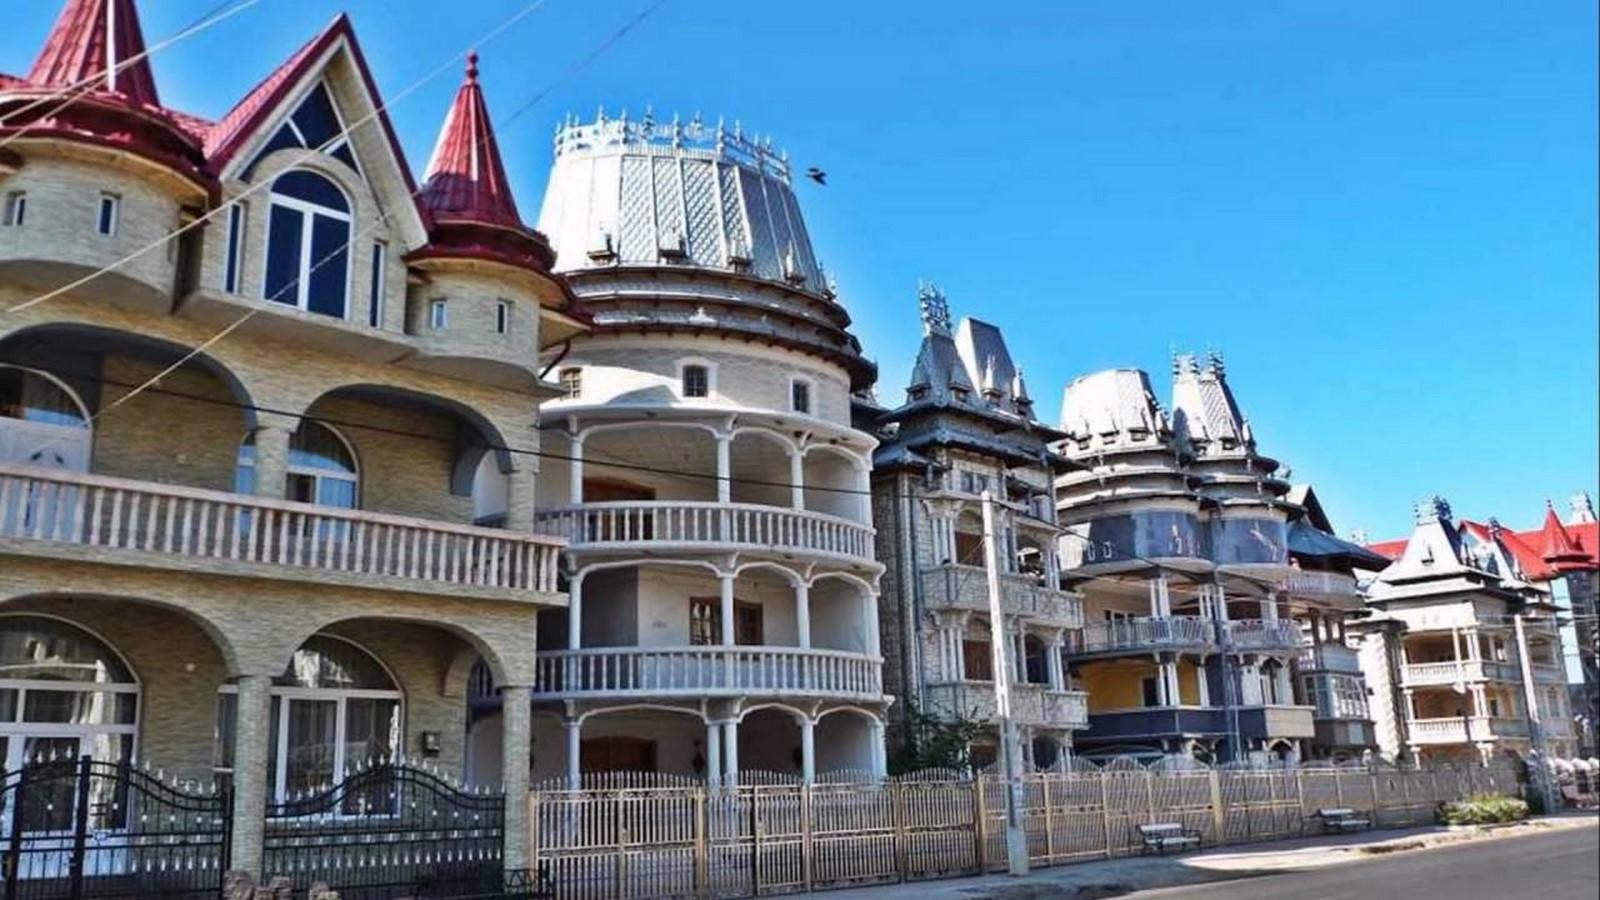 Kitsch Architecture: Developed by industrialization and urbanization Sheet12